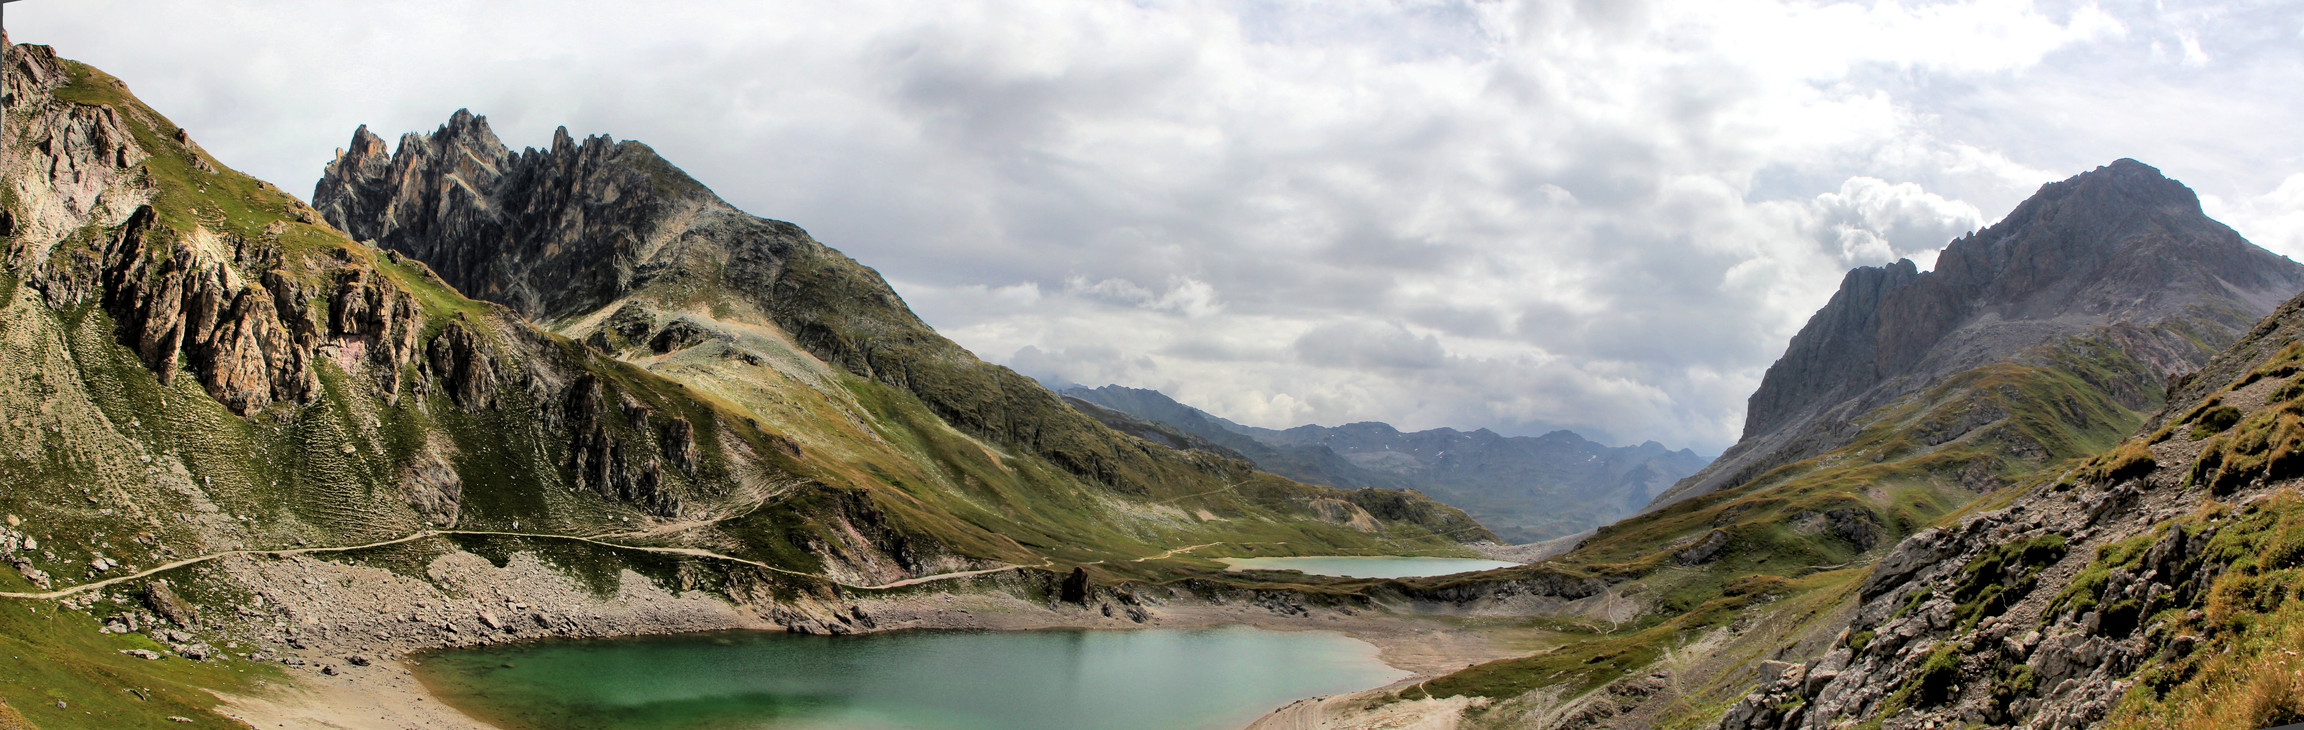 Panorama 9.jpg